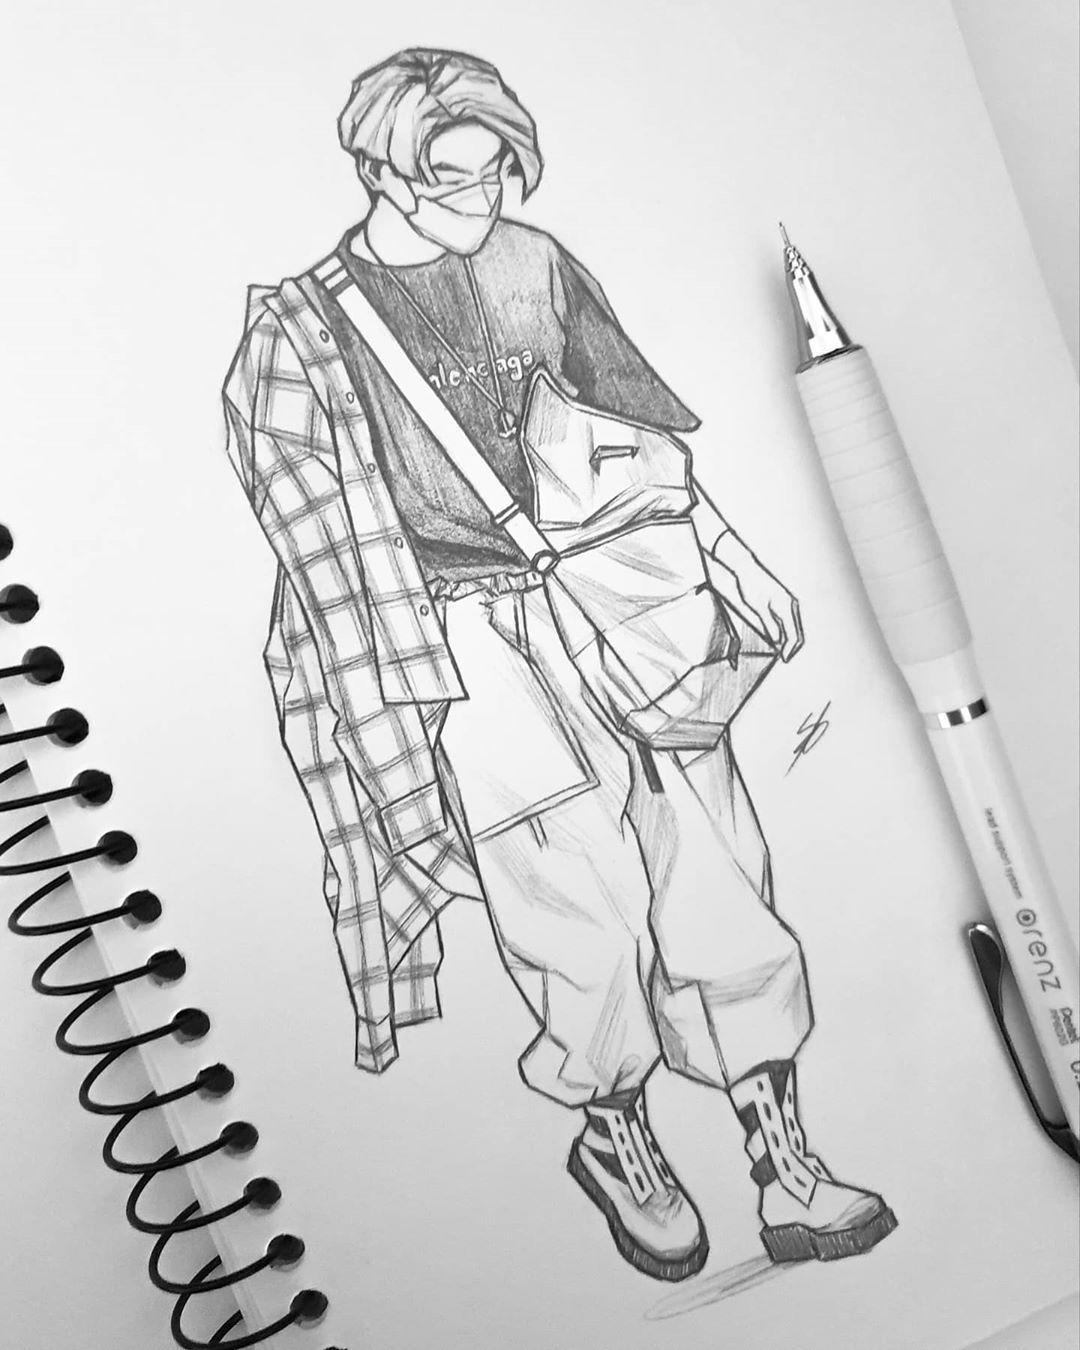 "Photo of • Nikki • on Instagram: ""200904 Jungkook isn't real, he can't hurt you. ⠀ 200904 Jungkook:  ⠀ #bts #btsfanart #fanart #Jungkook #art #drawing #sketch #kpop…"""